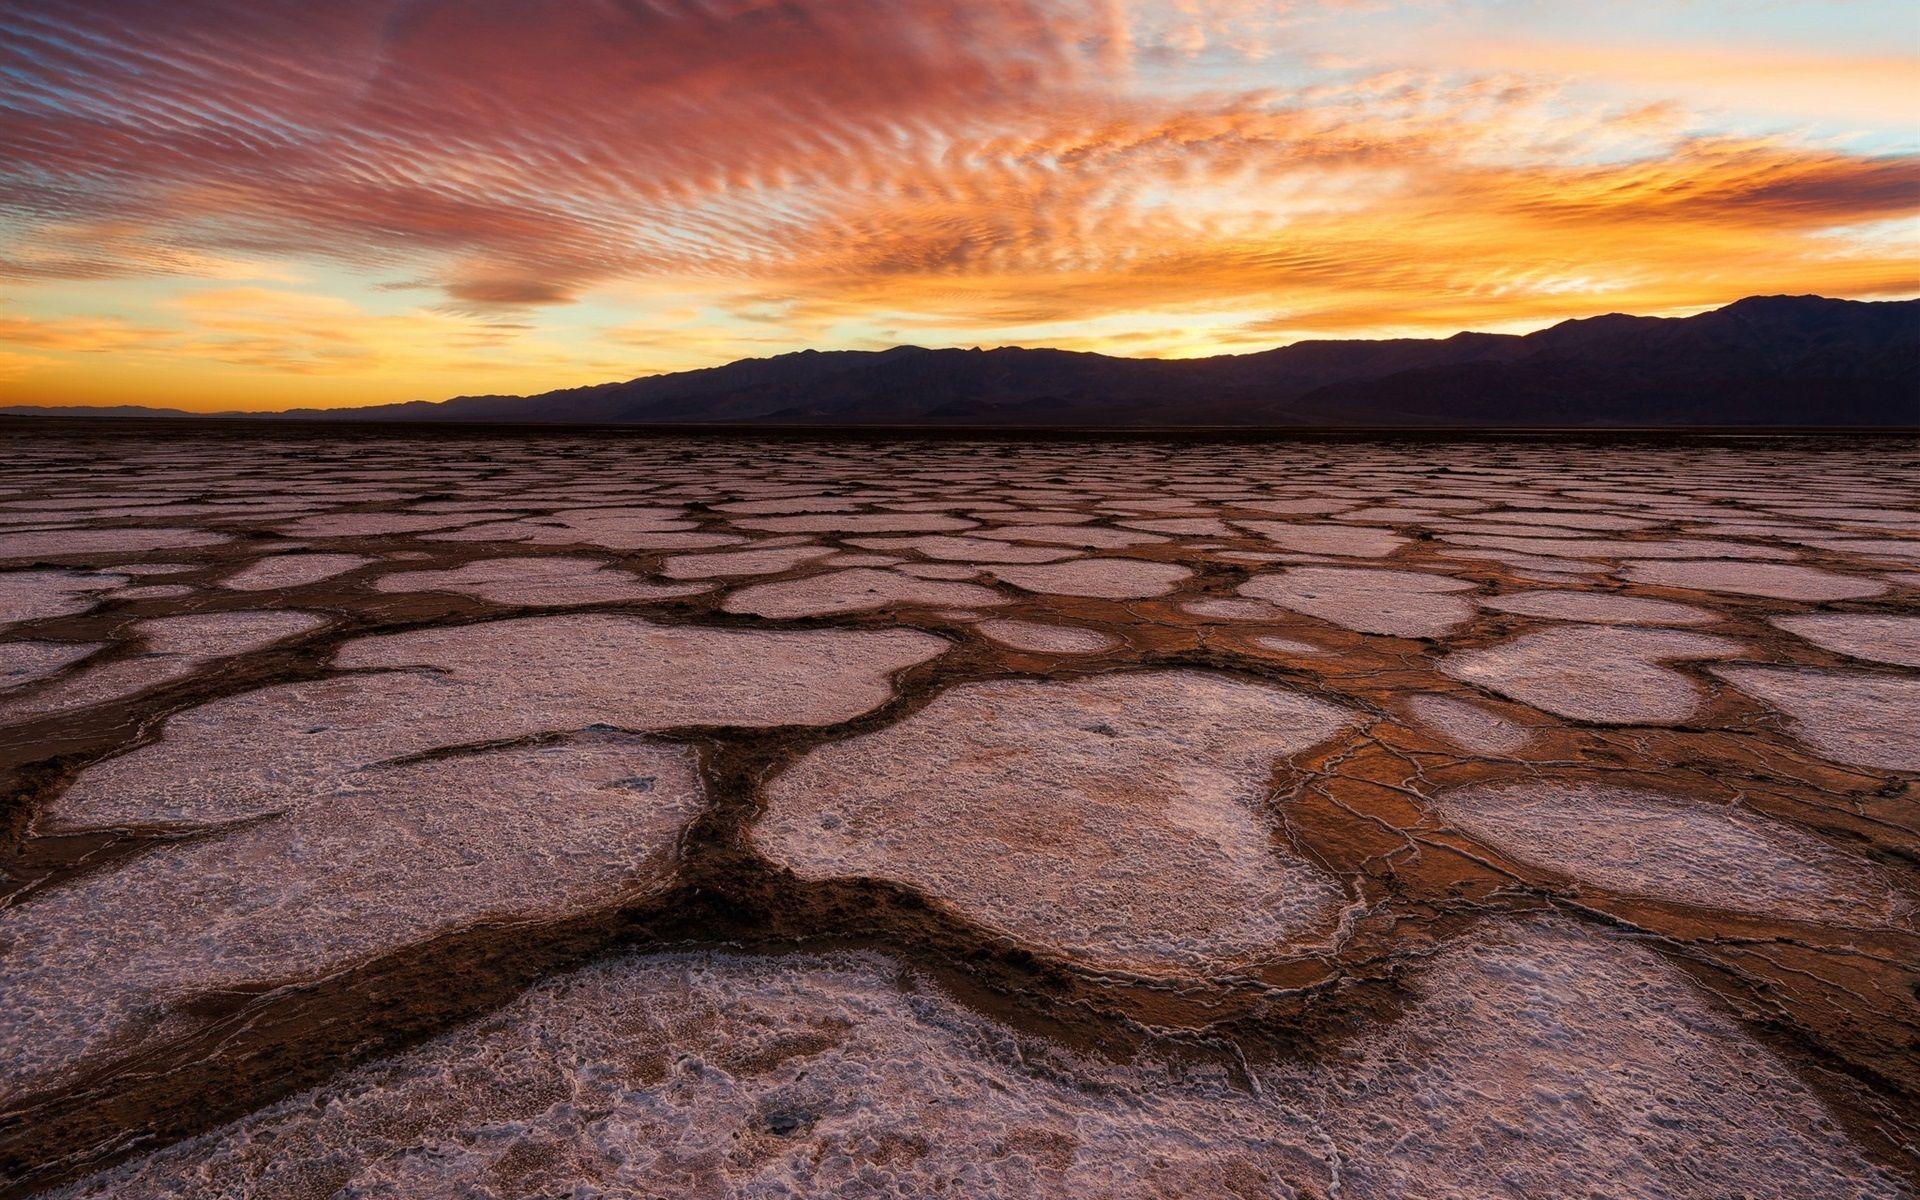 desert scenery pictures